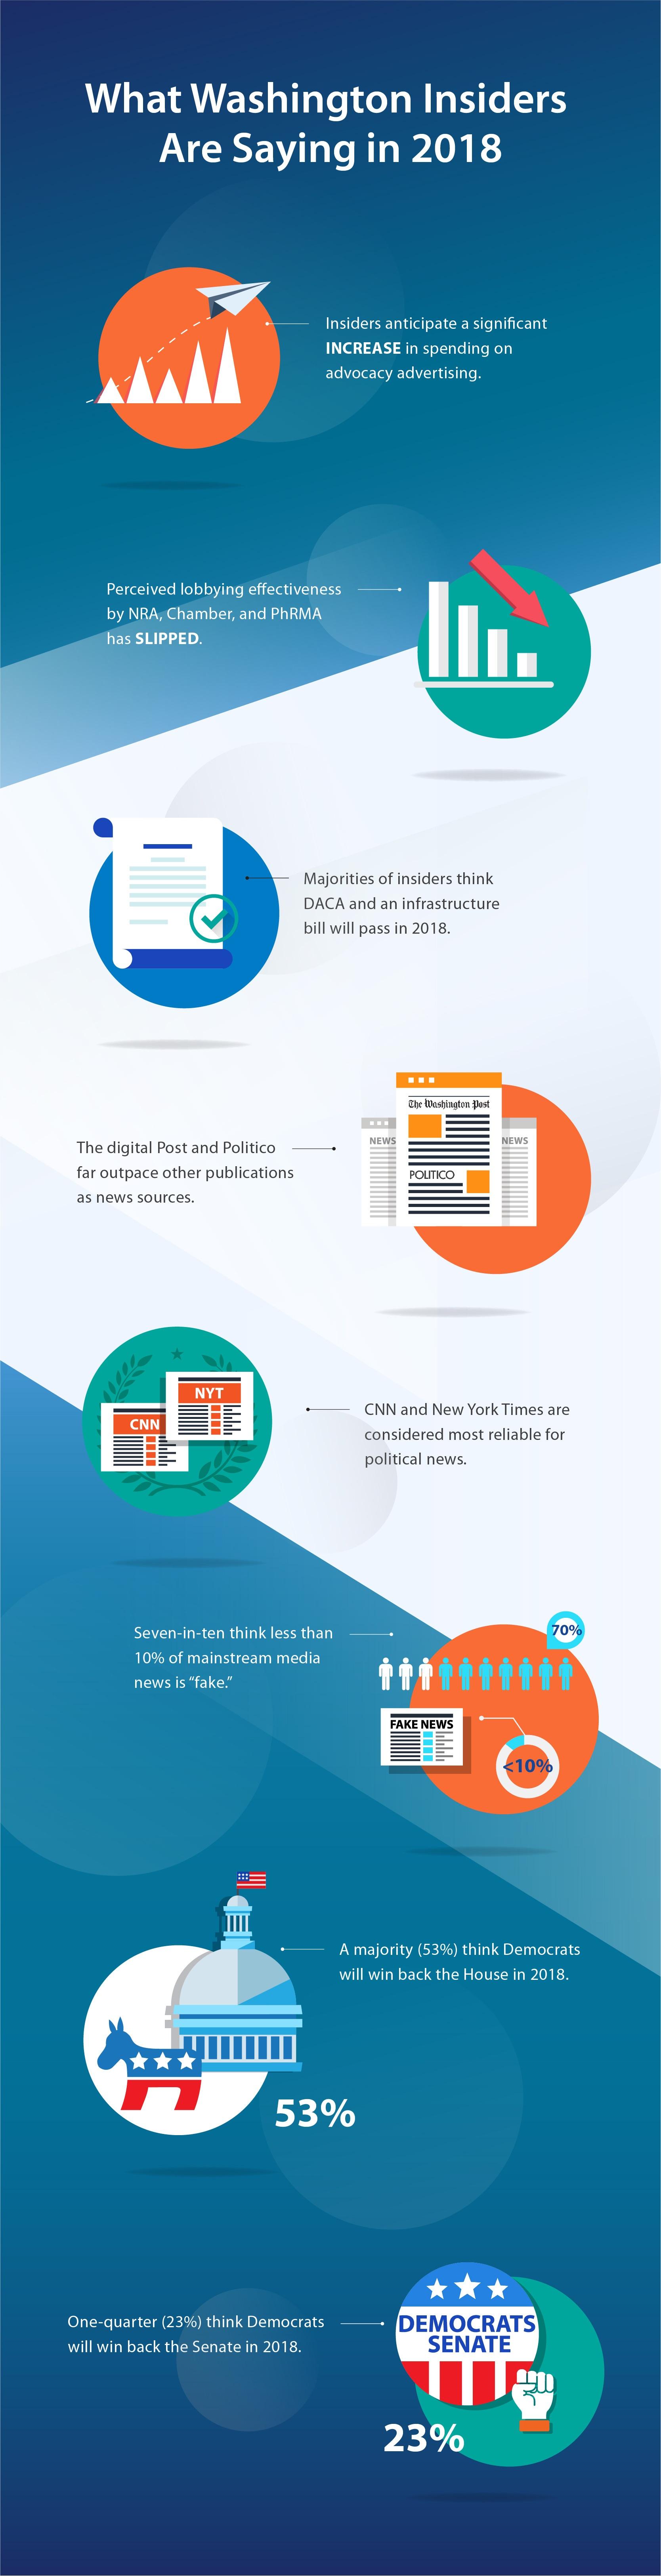 Washington Insiders Survey 2018 Infographic.jpg